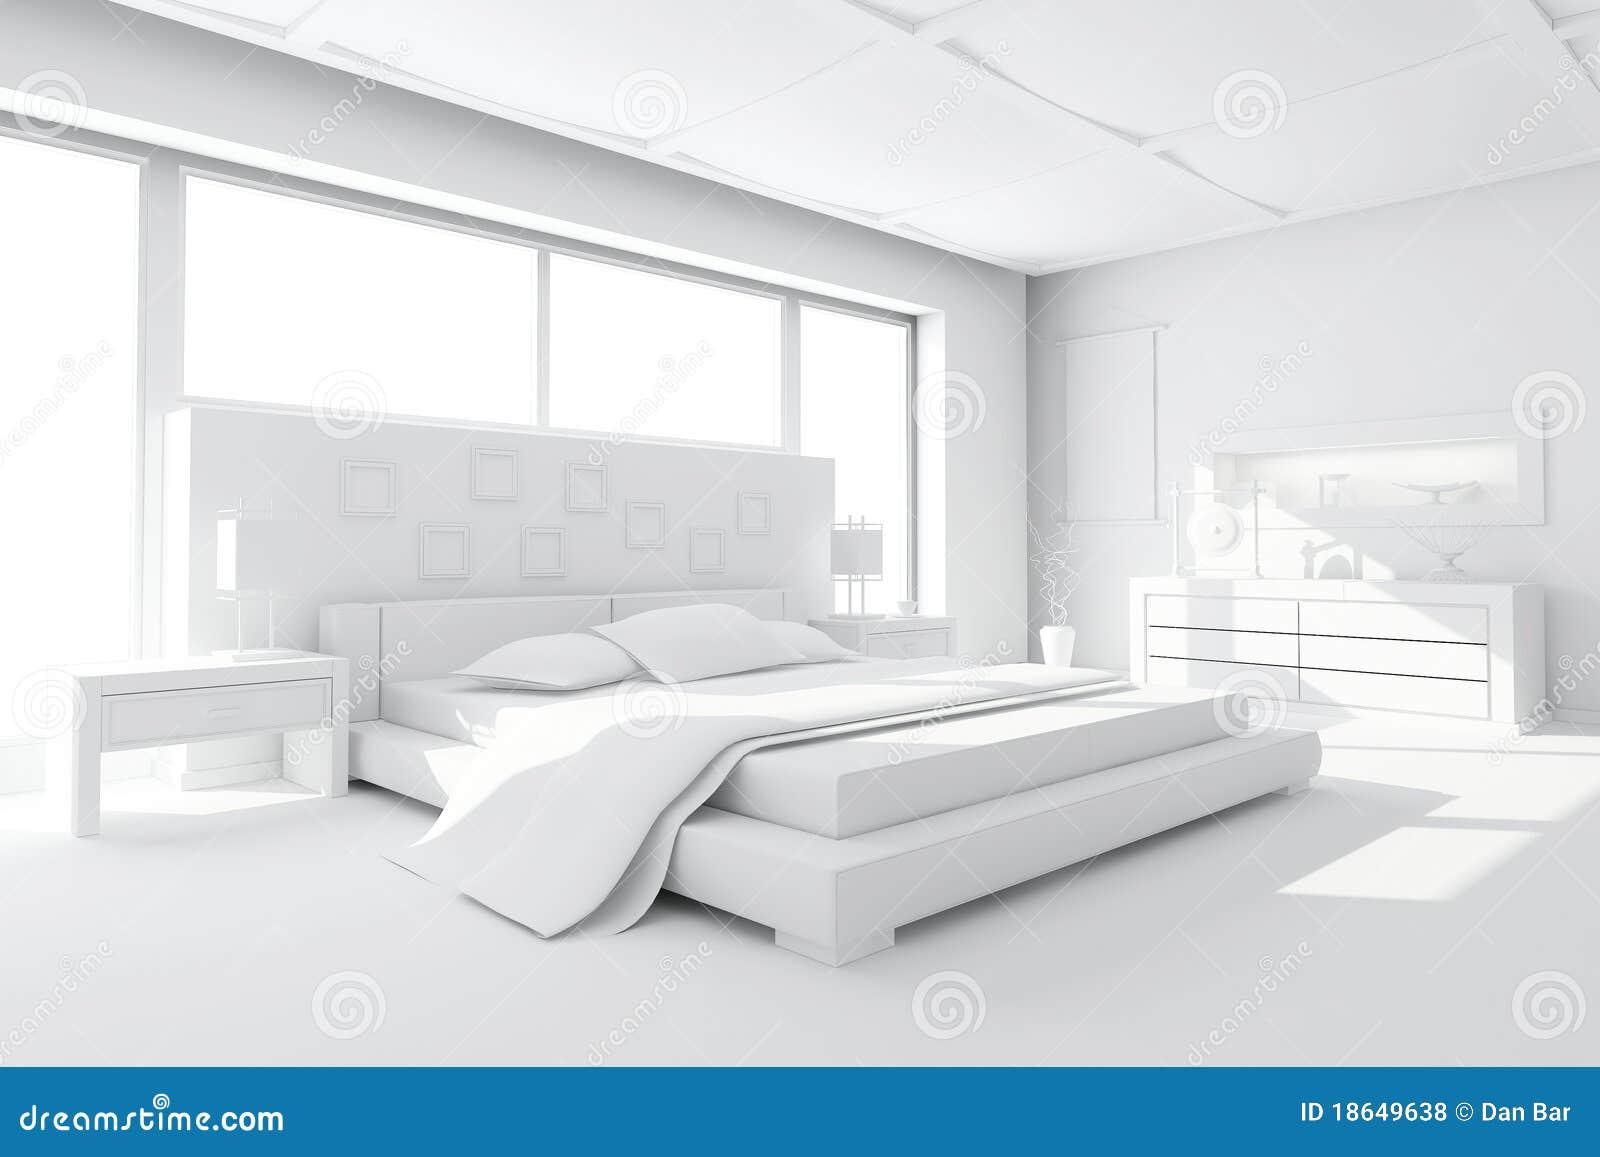 3d Clay Render Of A Modern Bedroom Stock Illustration ...